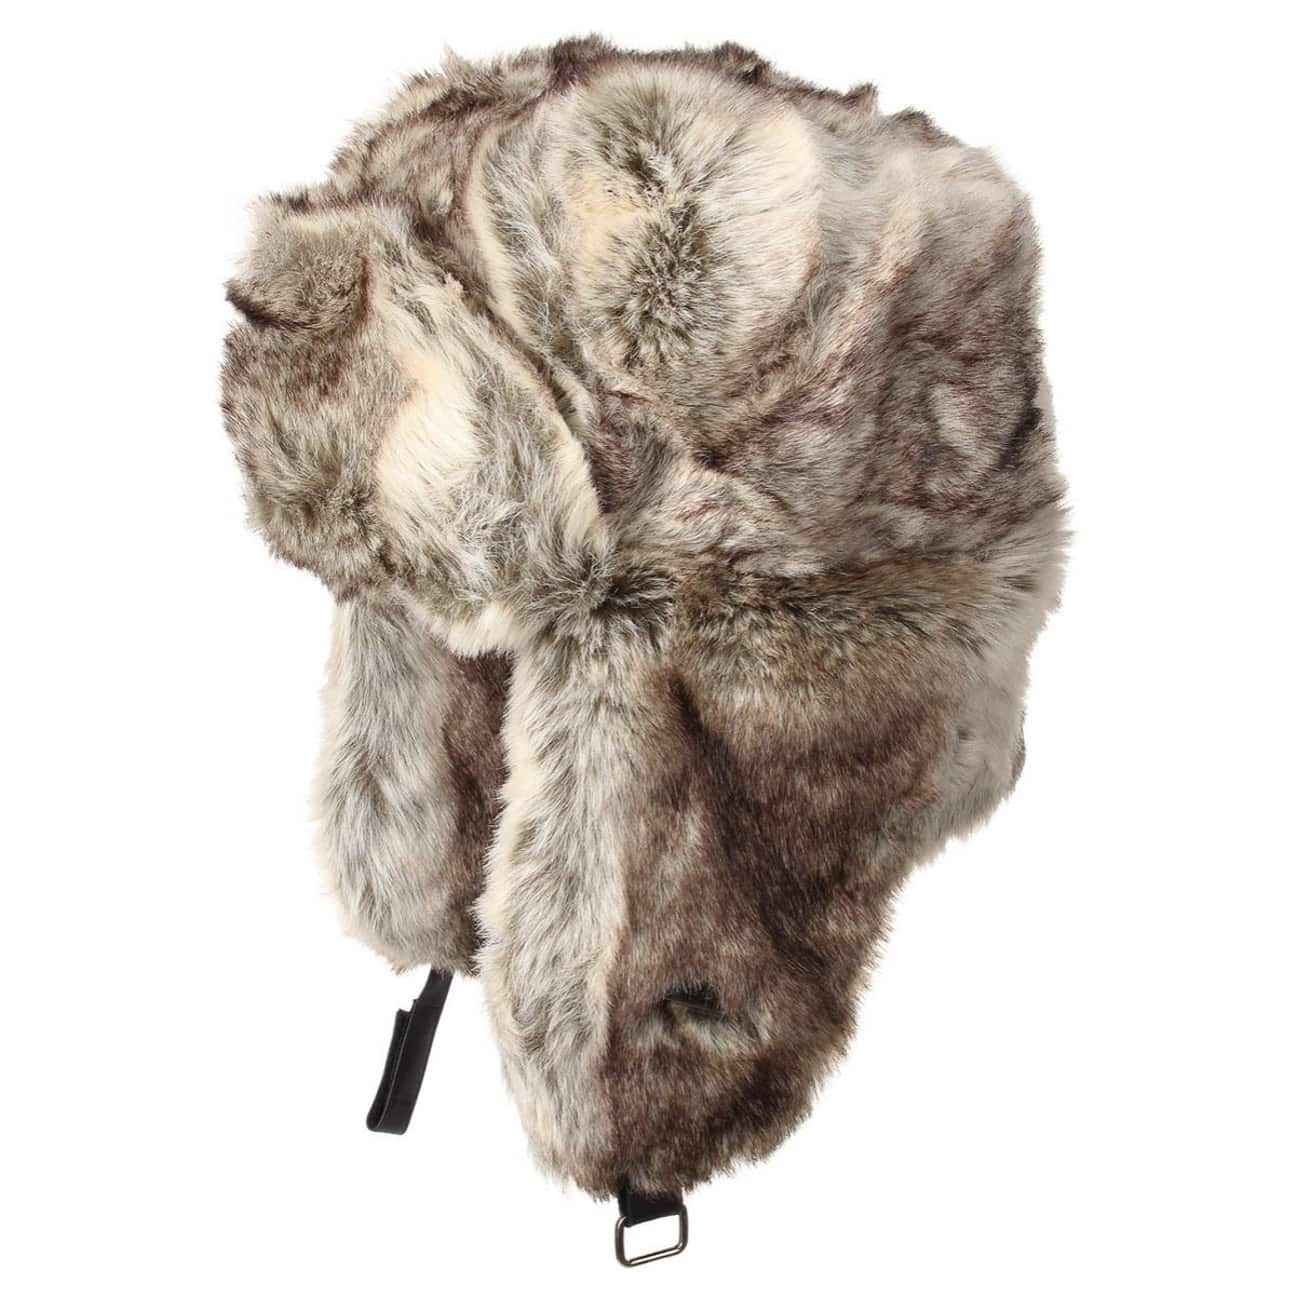 faux fur bomber rabbit chapka by barts eur 49 99 hats caps beanies shop online. Black Bedroom Furniture Sets. Home Design Ideas